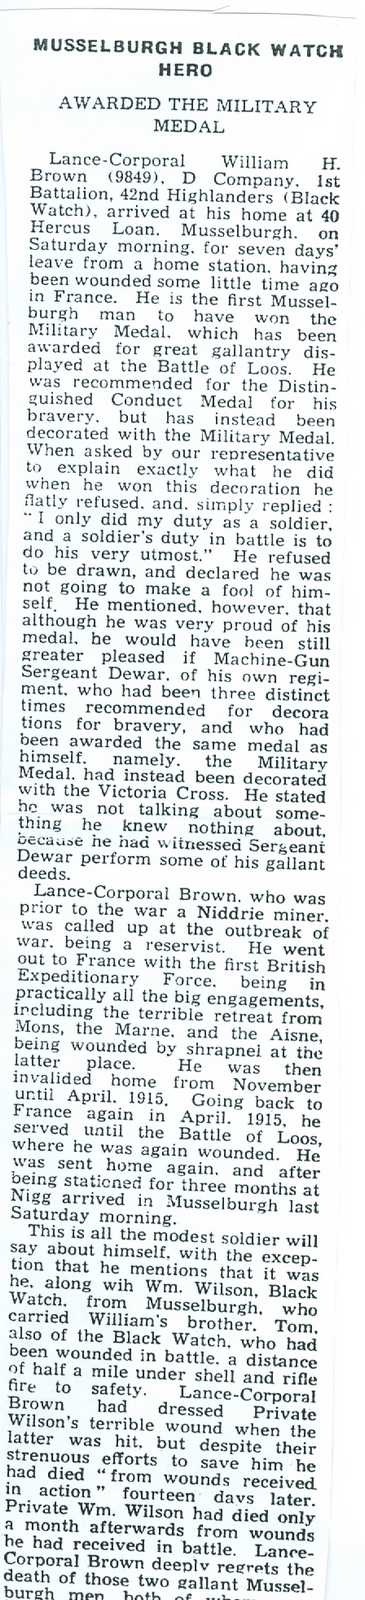 Newspaper article (1)